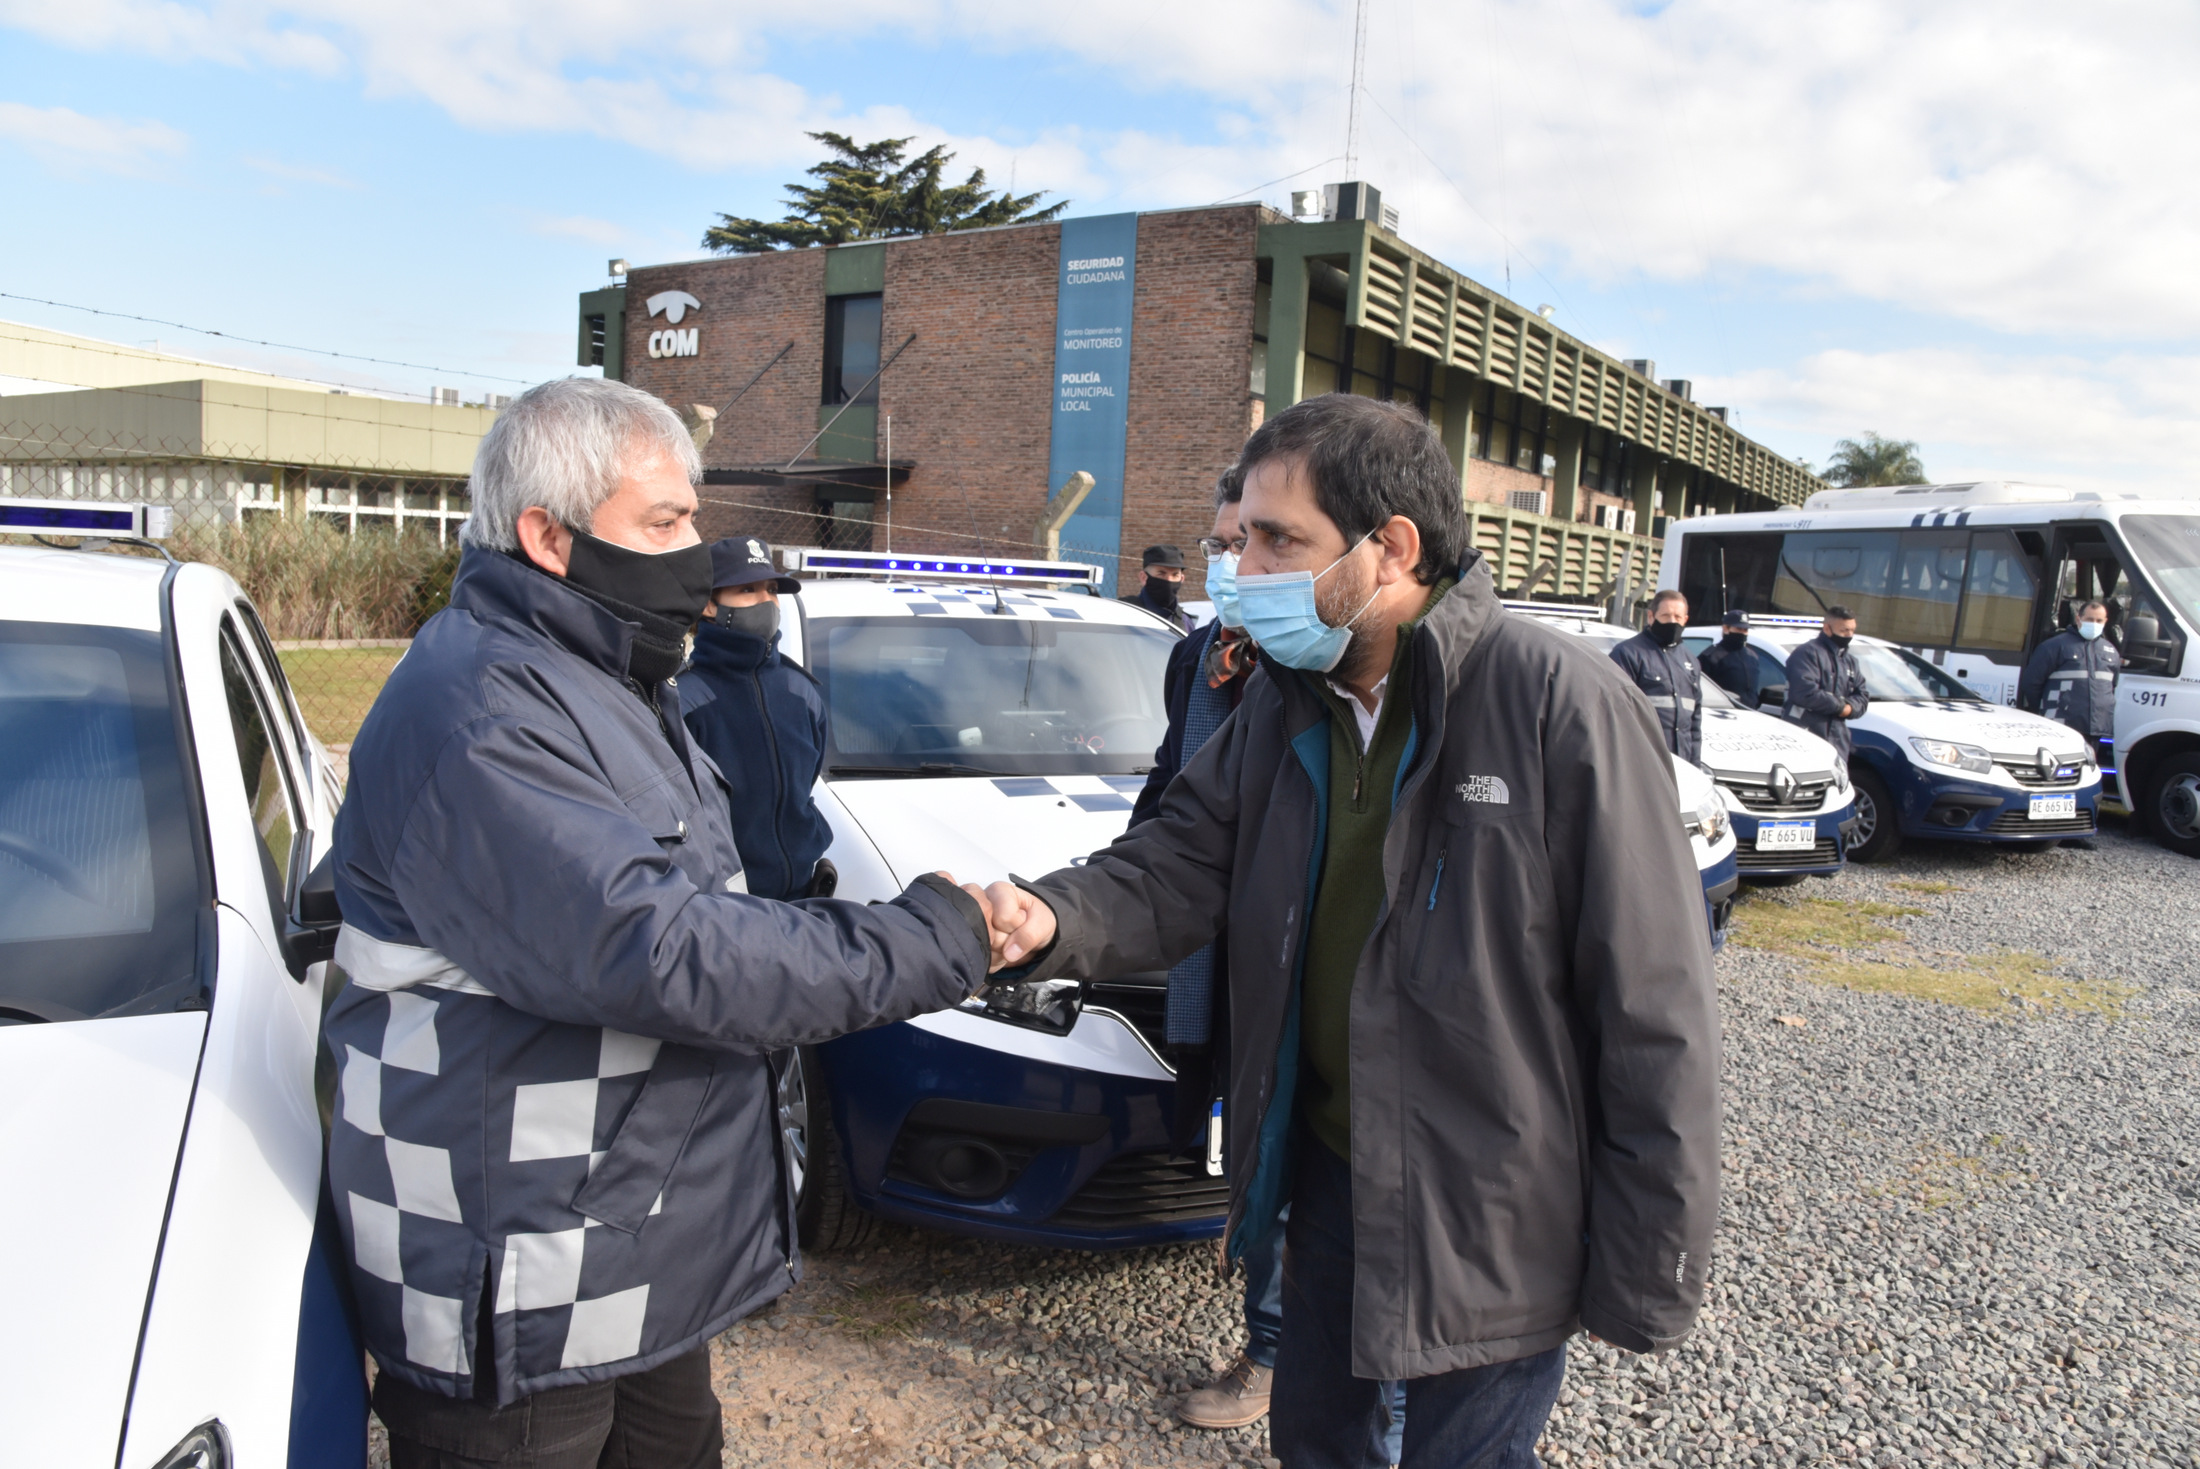 Moreira presentó 10 nuevos patrulleros de Protección Ciudadana